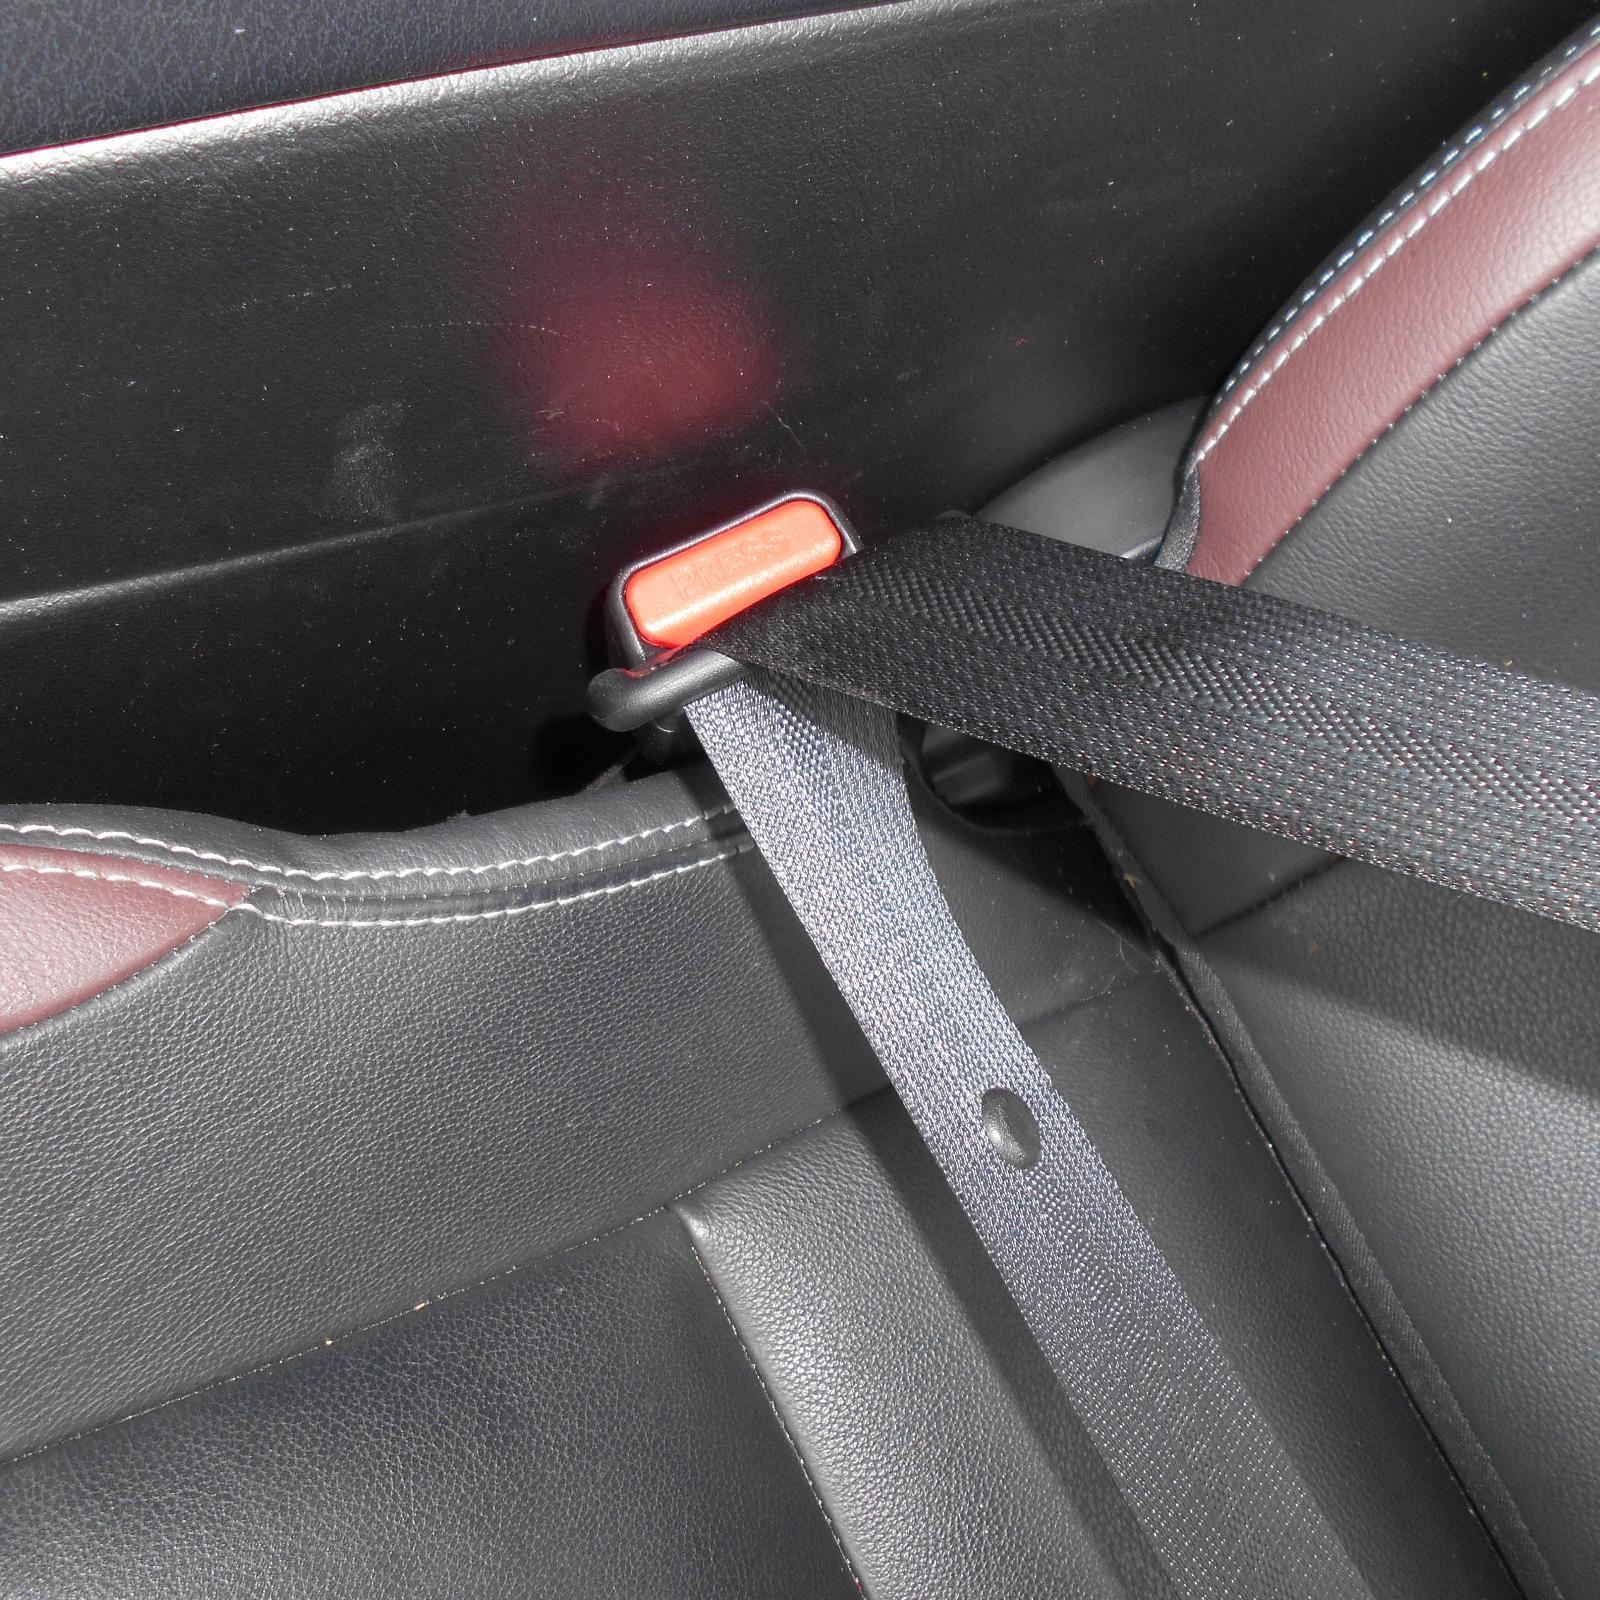 TOYOTA AURION, Seatbelt/Stalk, LH FRONT, SEAT BELT ONLY, GSV50R, 02/12-08/17